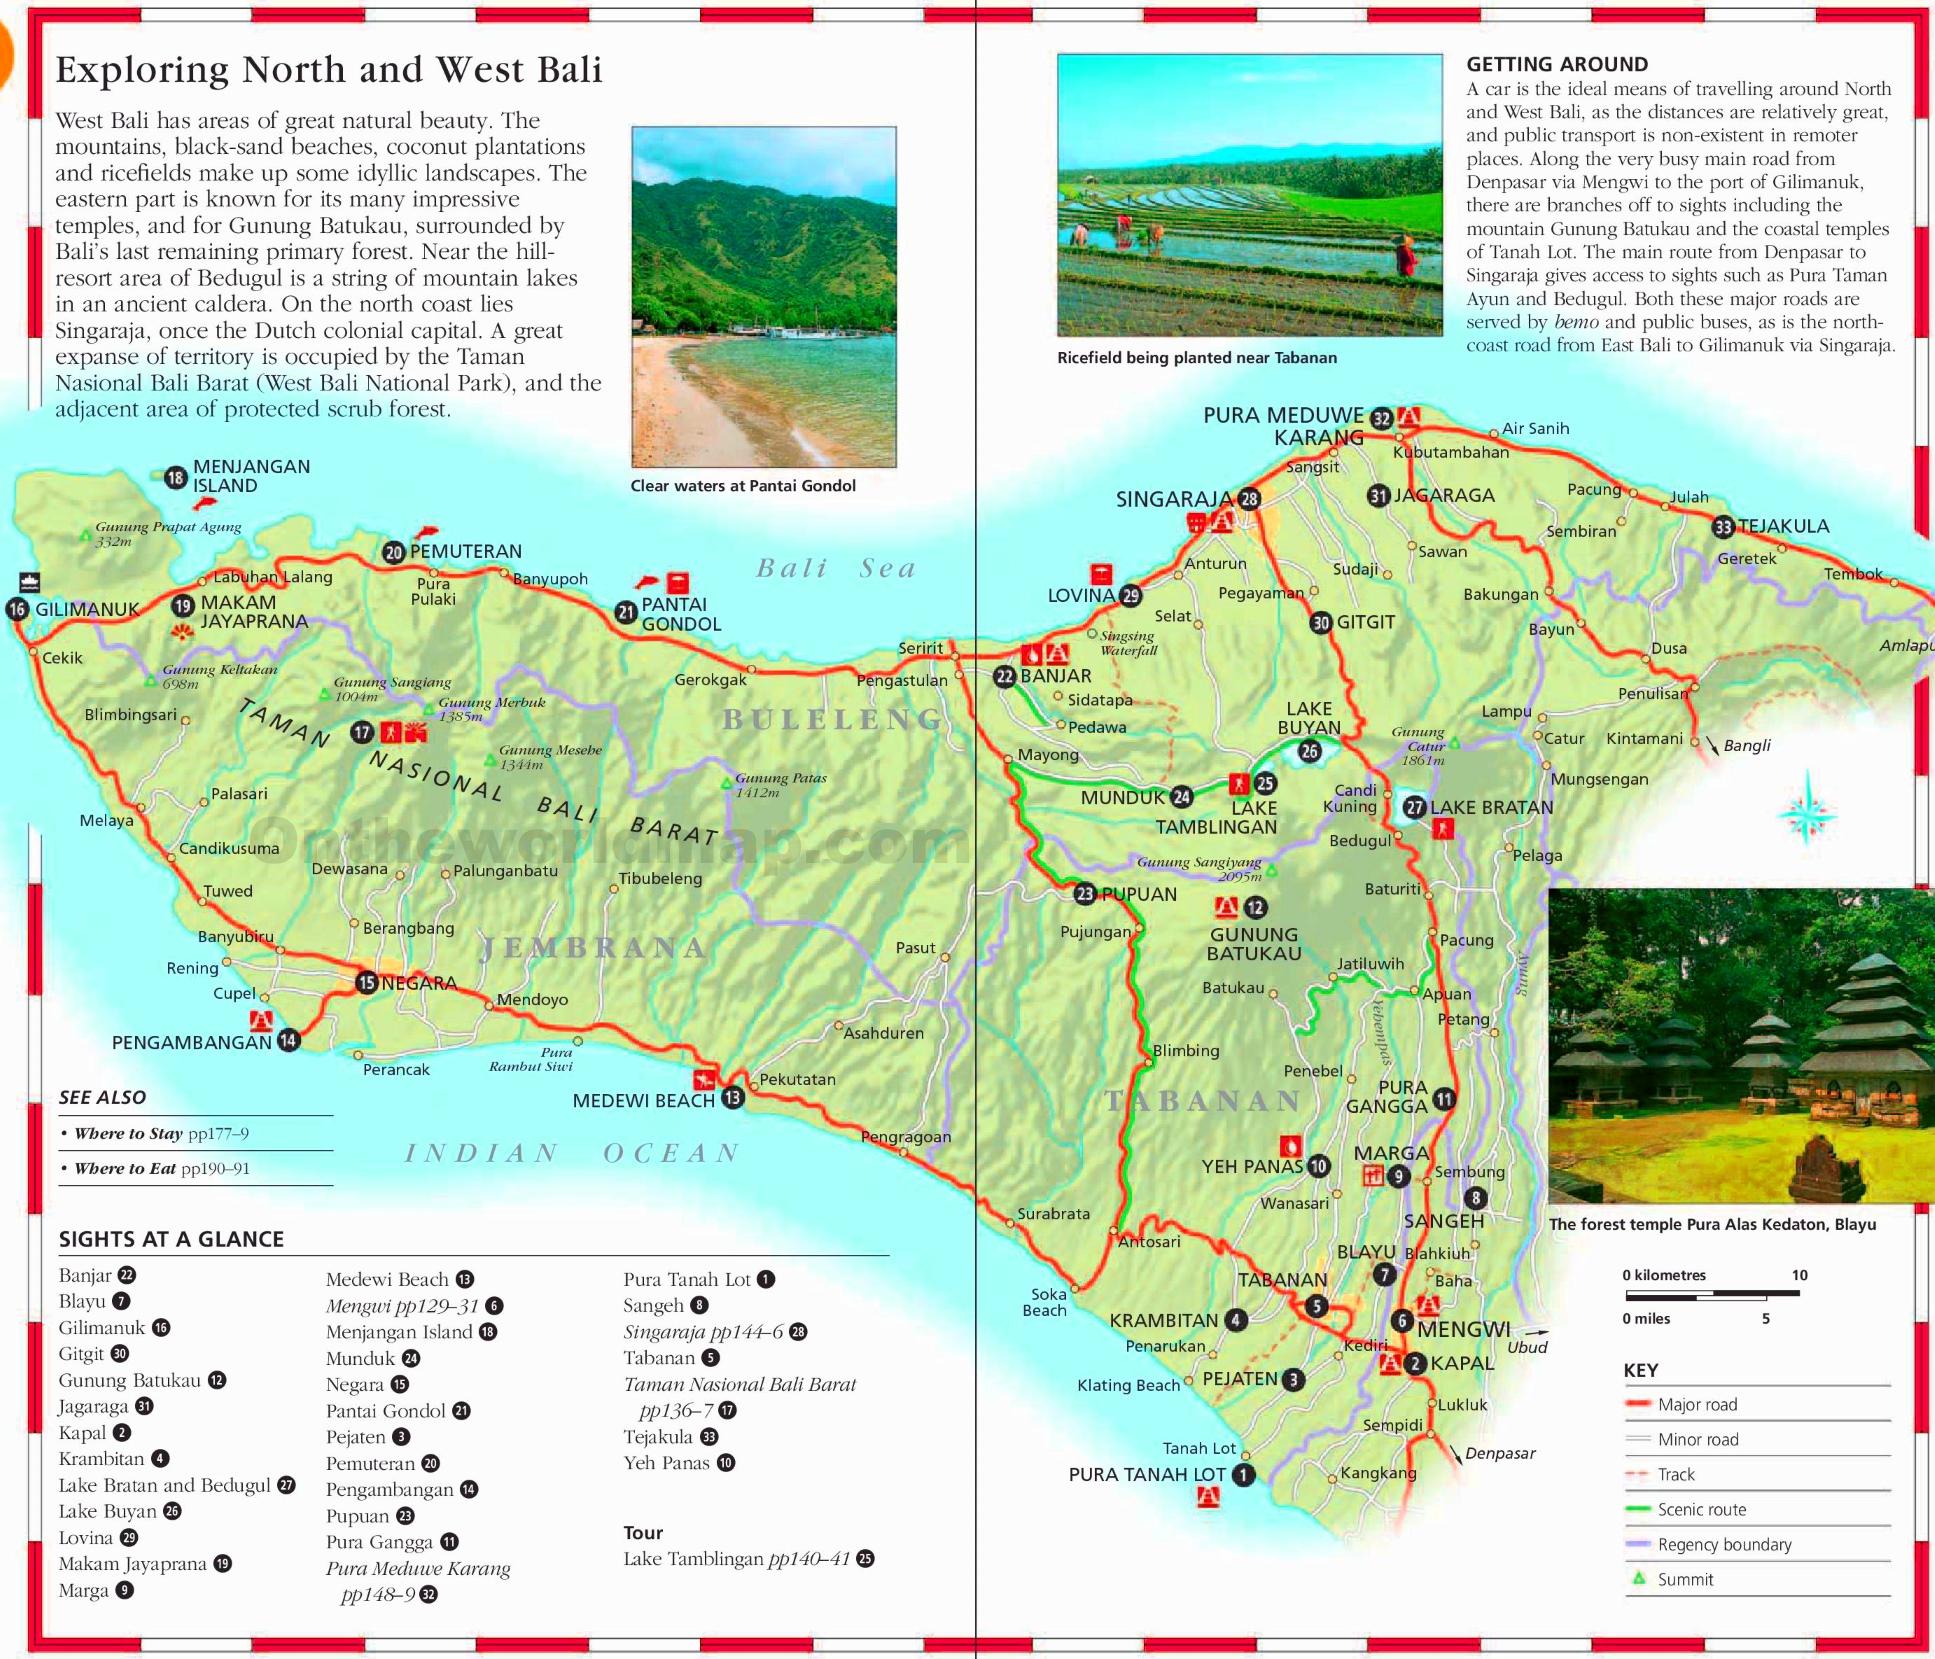 Bali Tourist Map Bali tourist map Bali Tourist Map